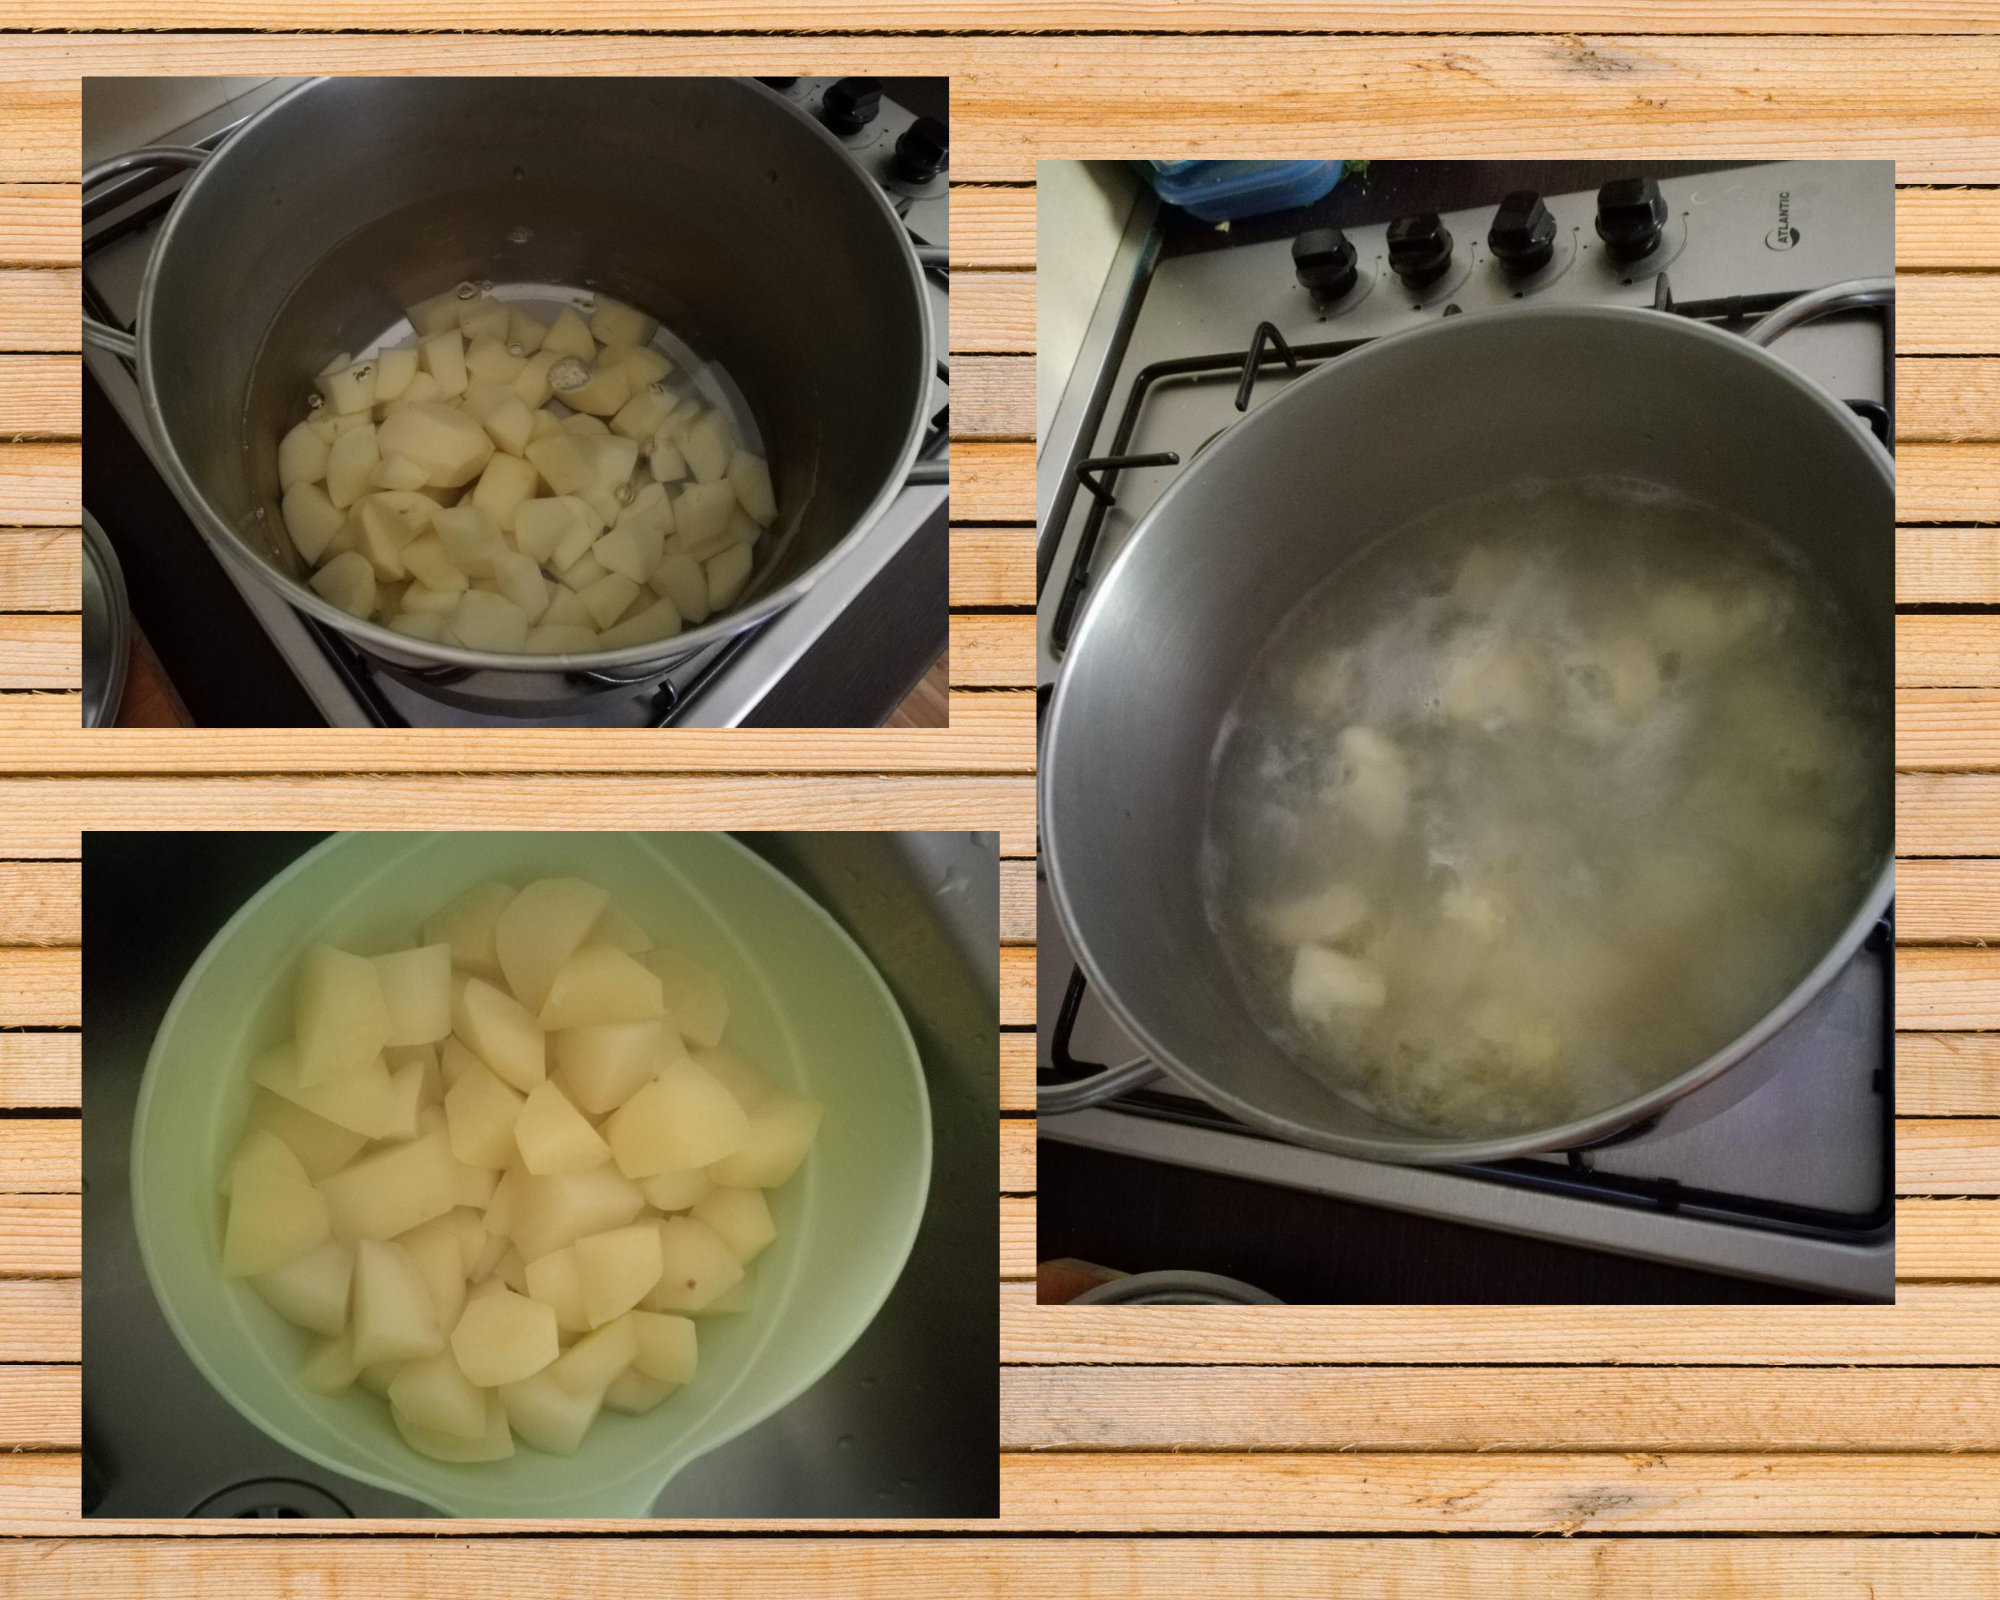 patate sabbiose bollitura